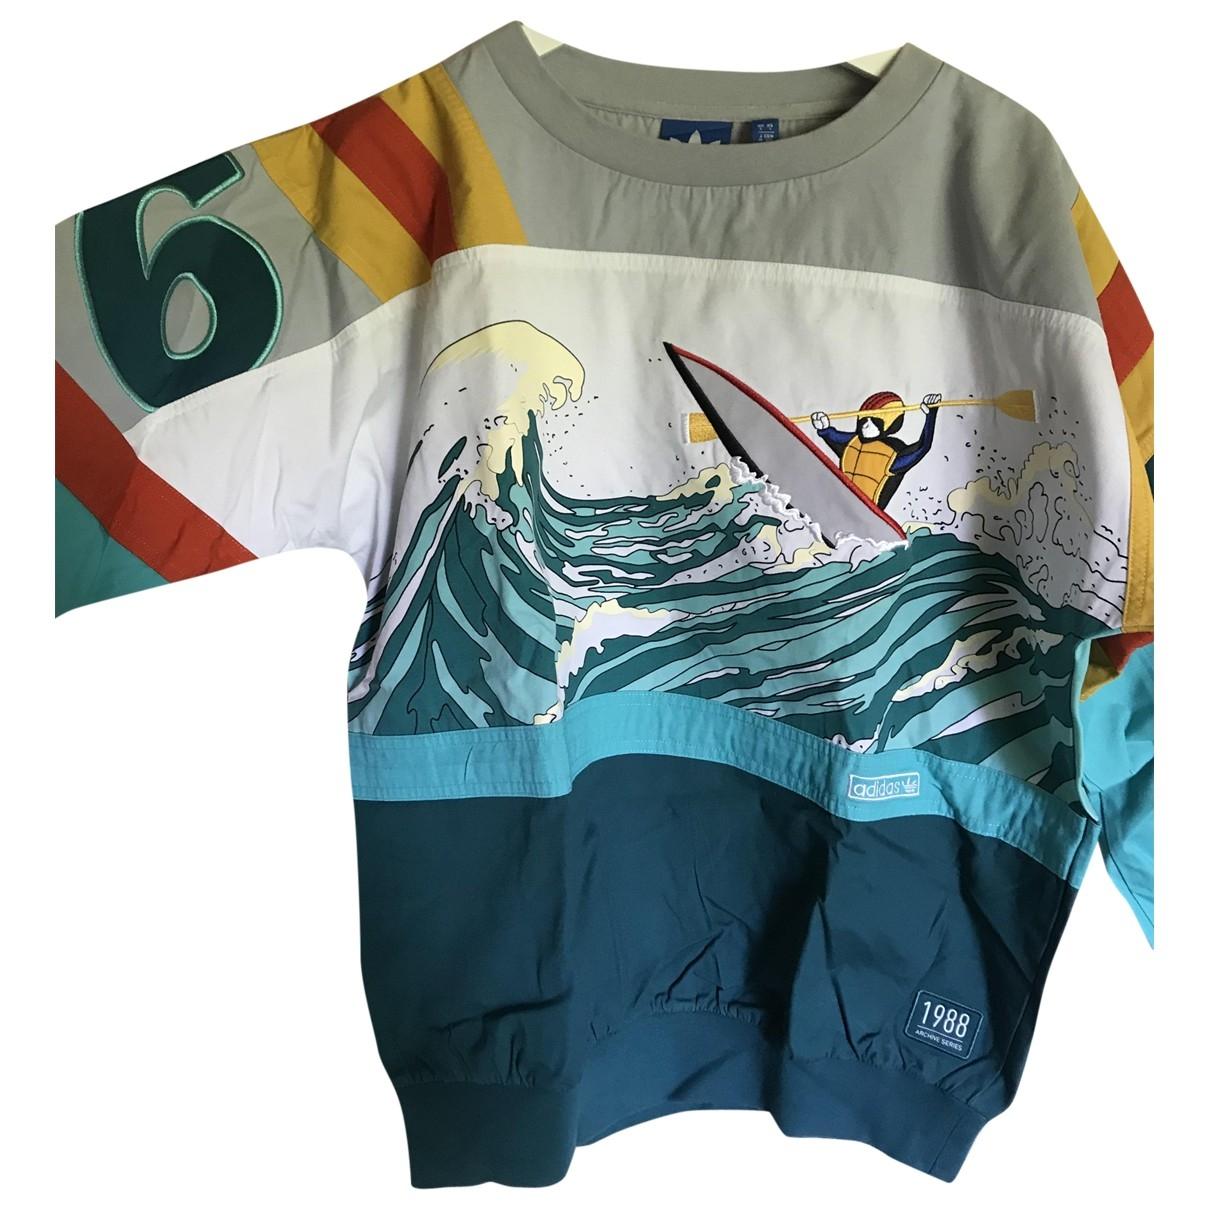 Adidas \N Turquoise Cotton Knitwear & Sweatshirts for Men S International